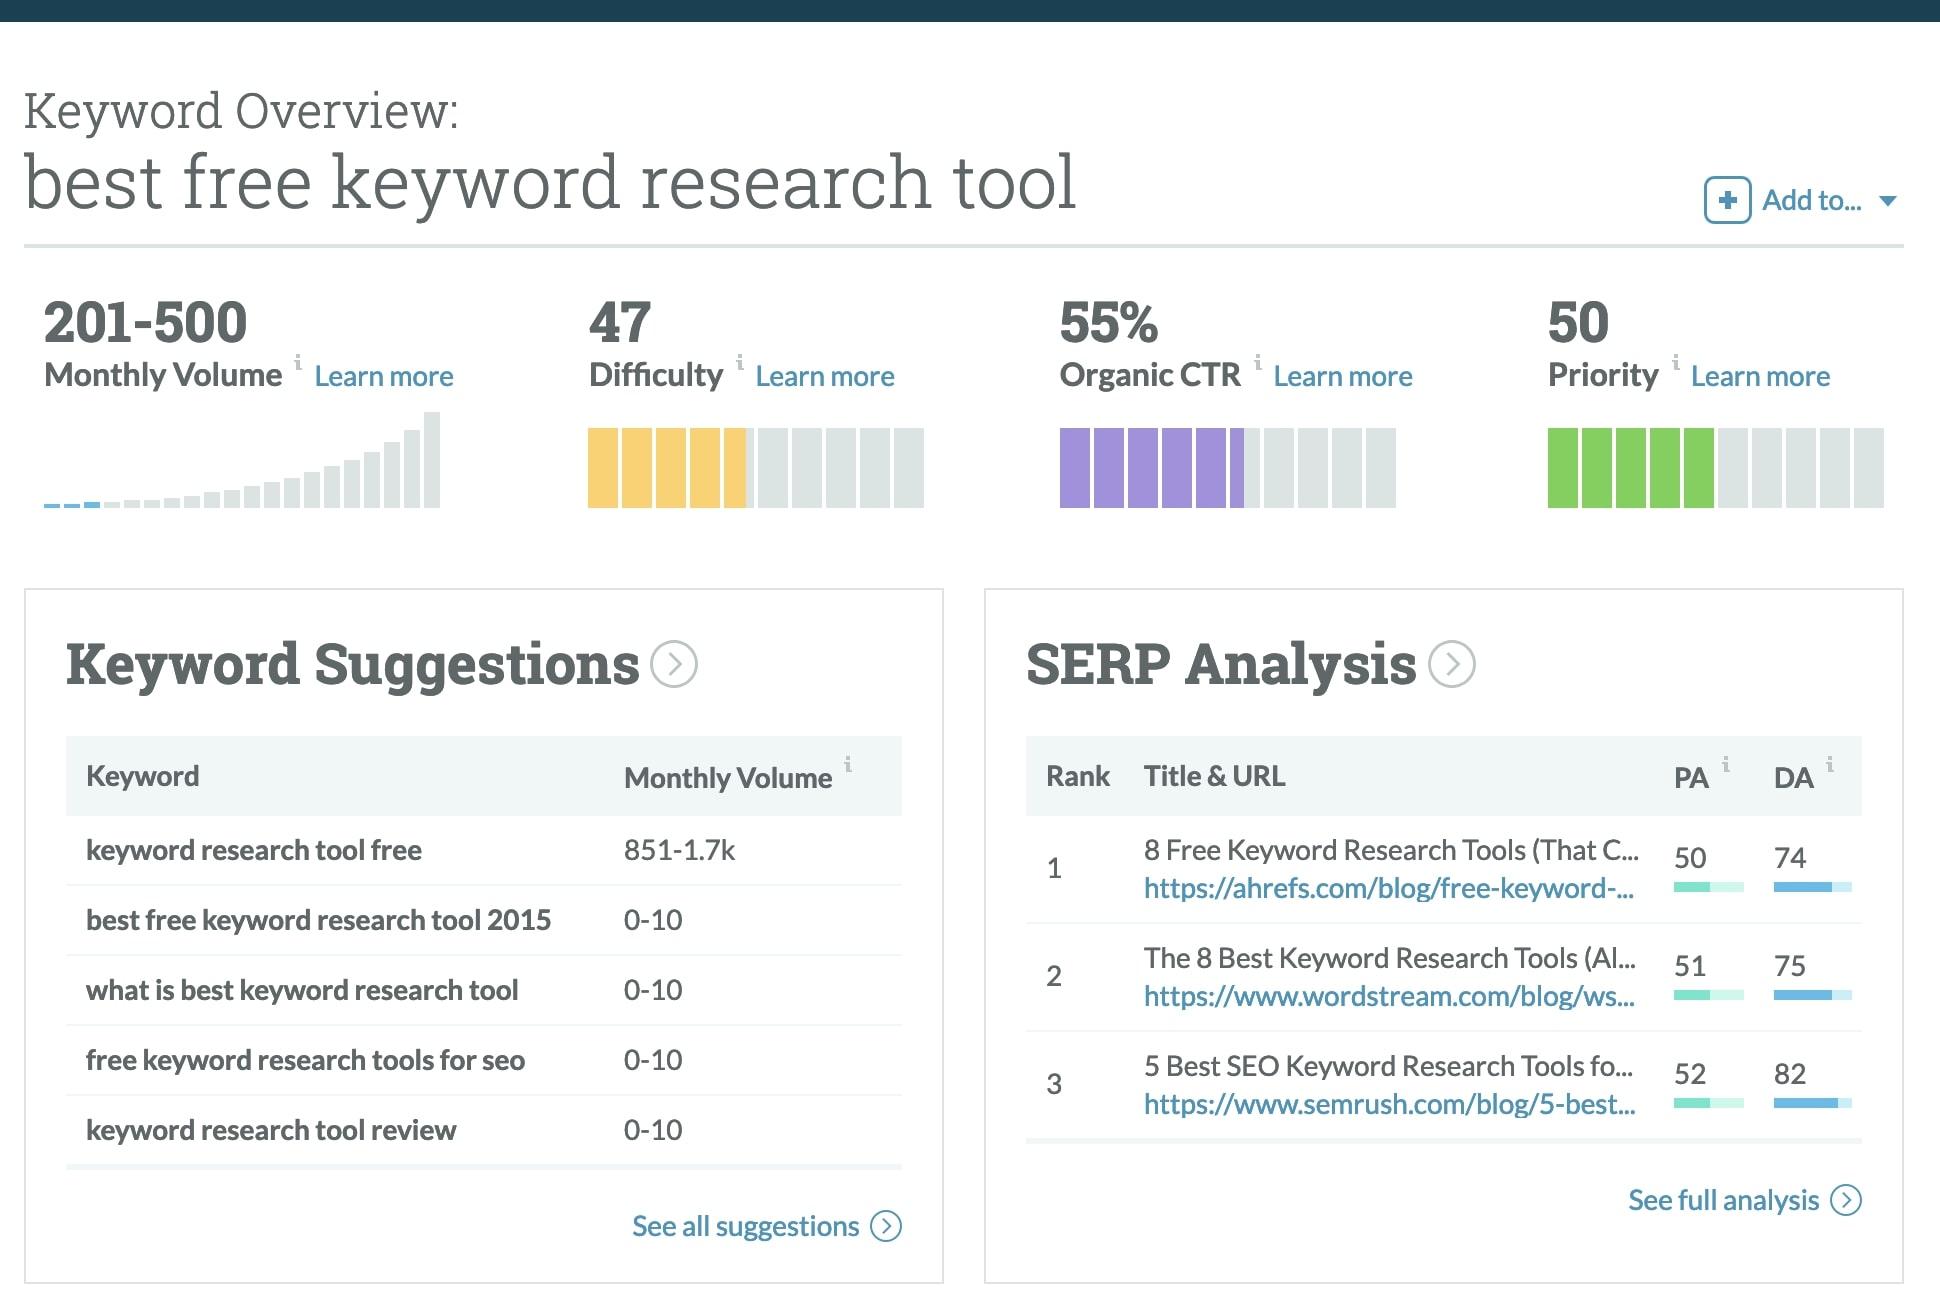 Keyword Research Tool Image.jpg